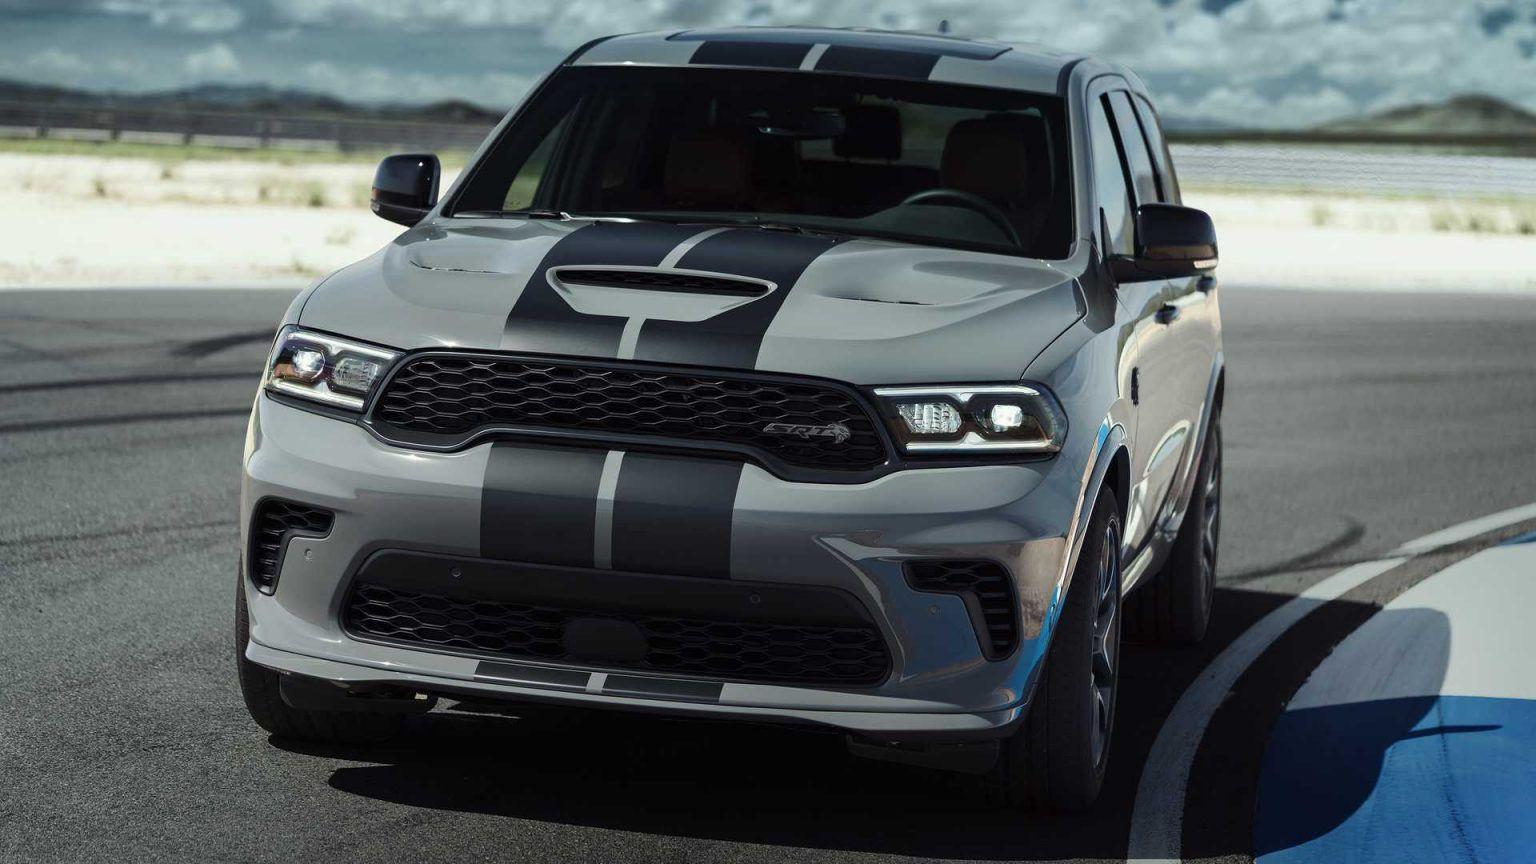 2021 Dodge Durango Srt Hellcat In 2020 Dodge Durango Srt Hellcat Hellcat Engine